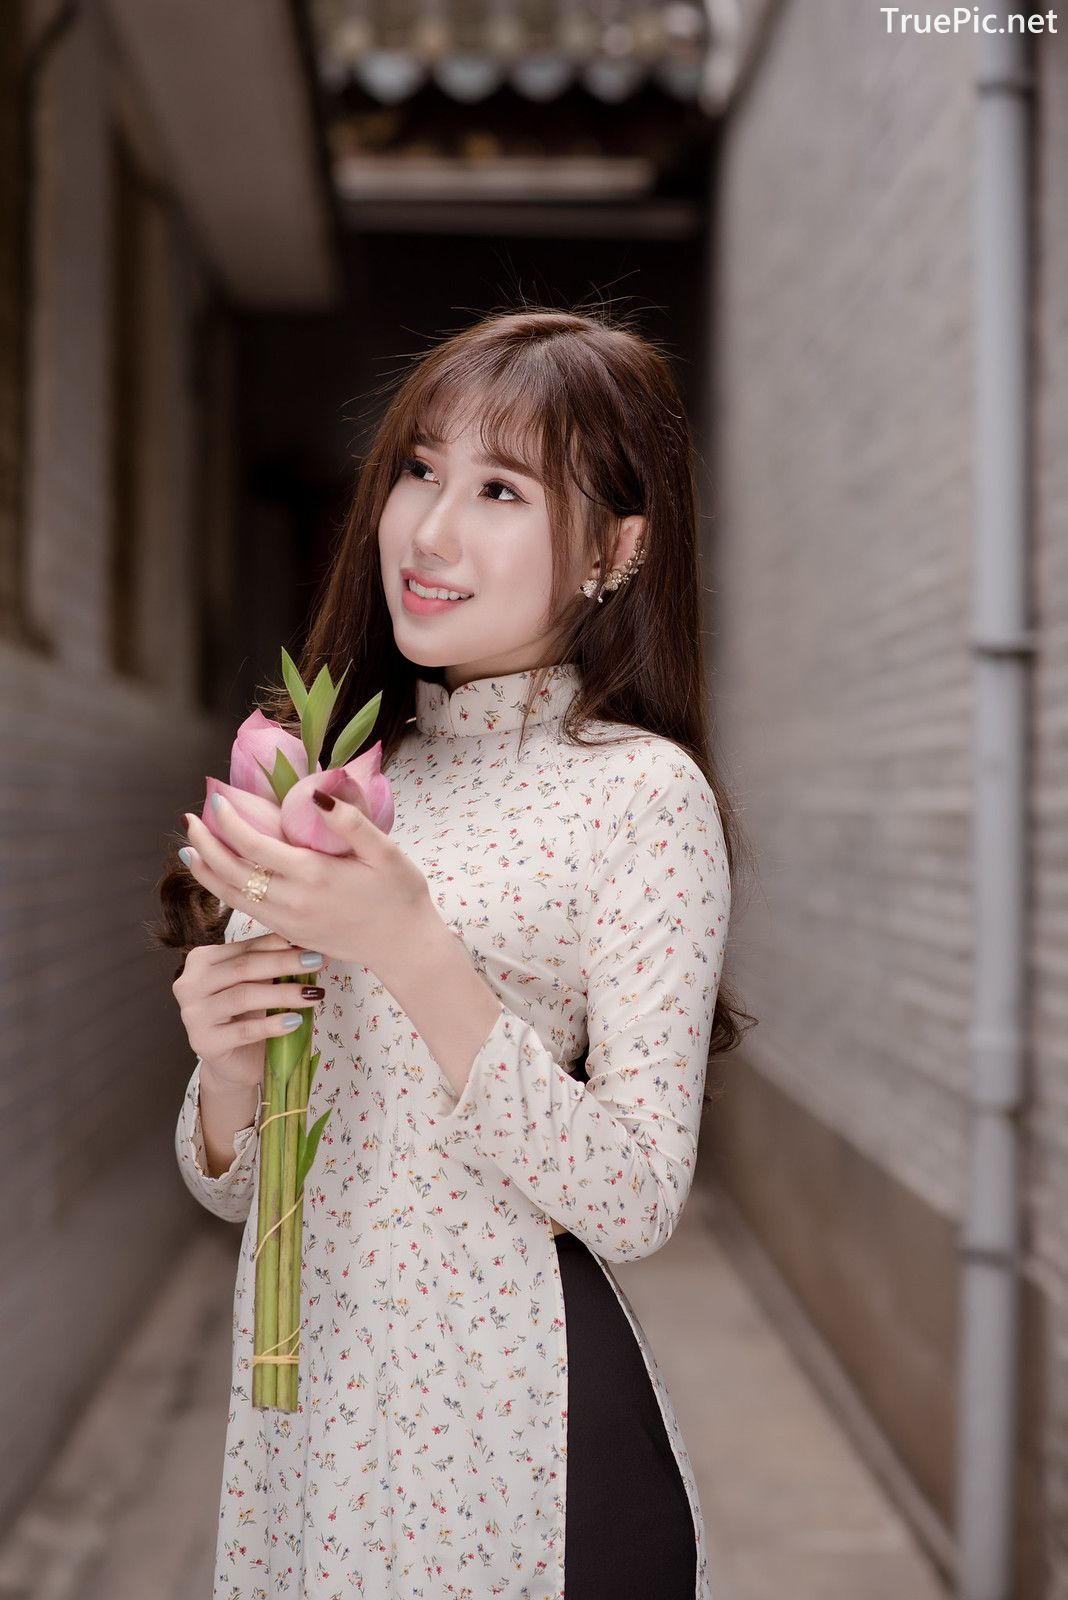 Image-Vietnamese-Beautiful-Girl-Ao-Dai-Vietnam-Traditional-Dress-by-VIN-Photo-2-TruePic.net- Picture-5